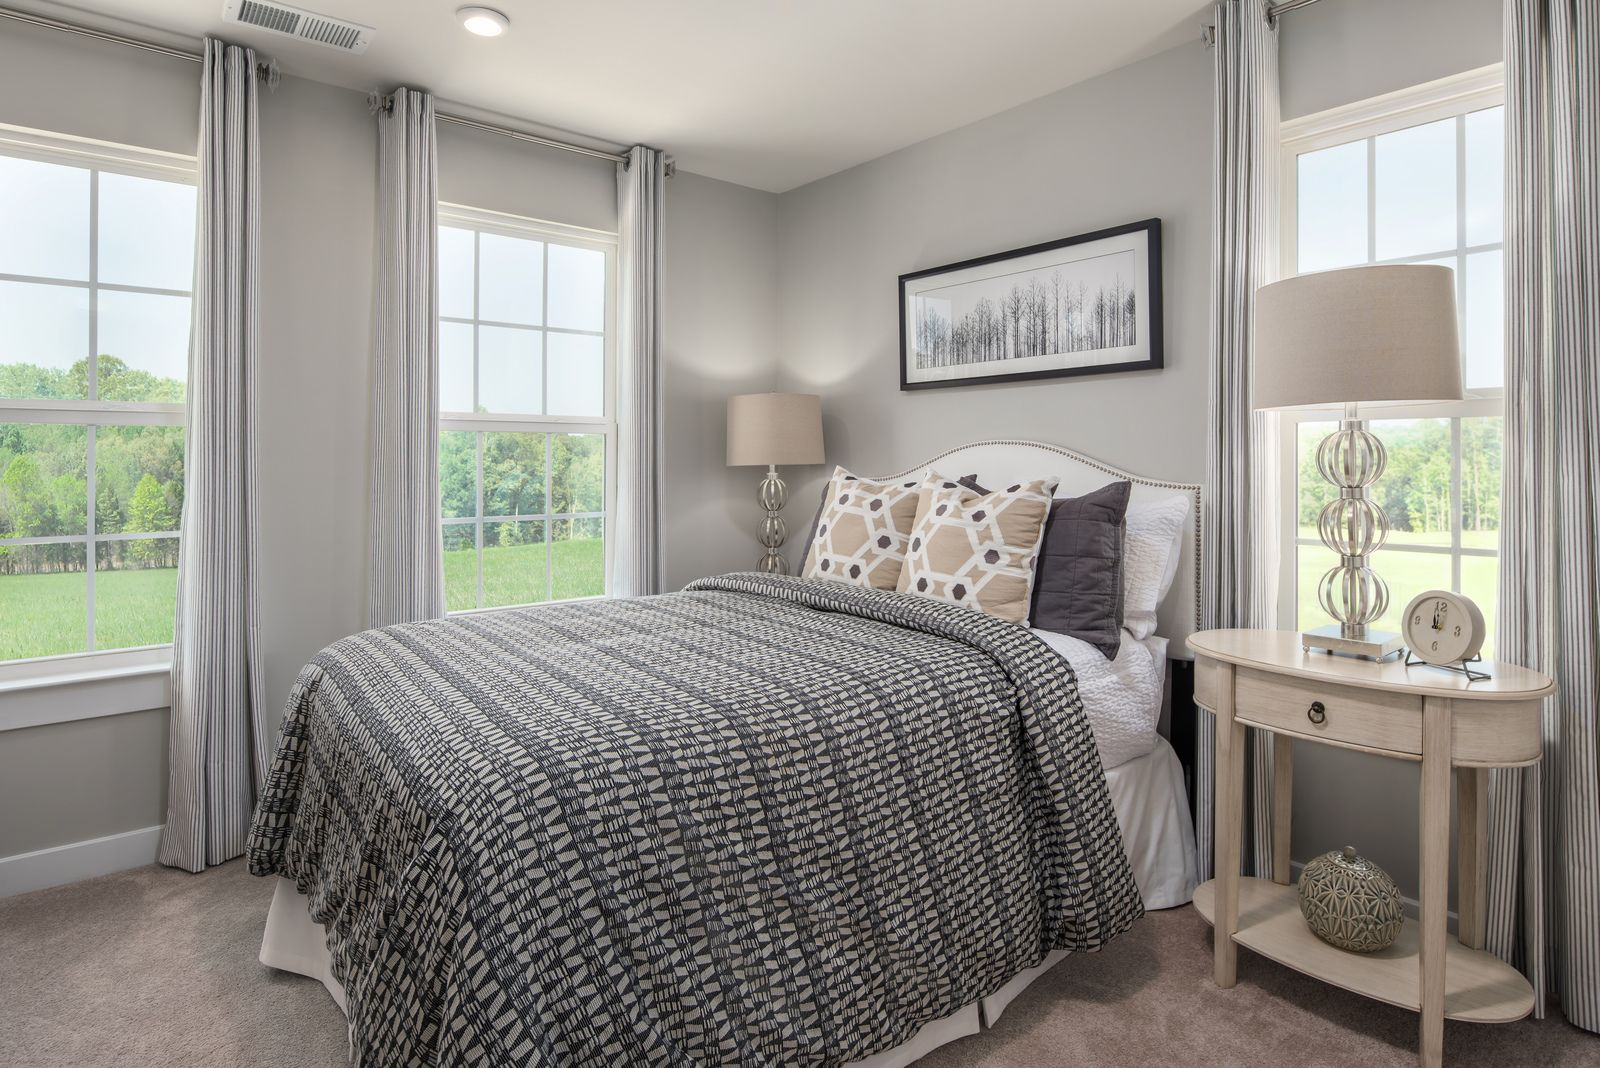 Bedroom featured in the Mendelssohn with 1-Car Garage By Ryan Homes in Philadelphia, NJ